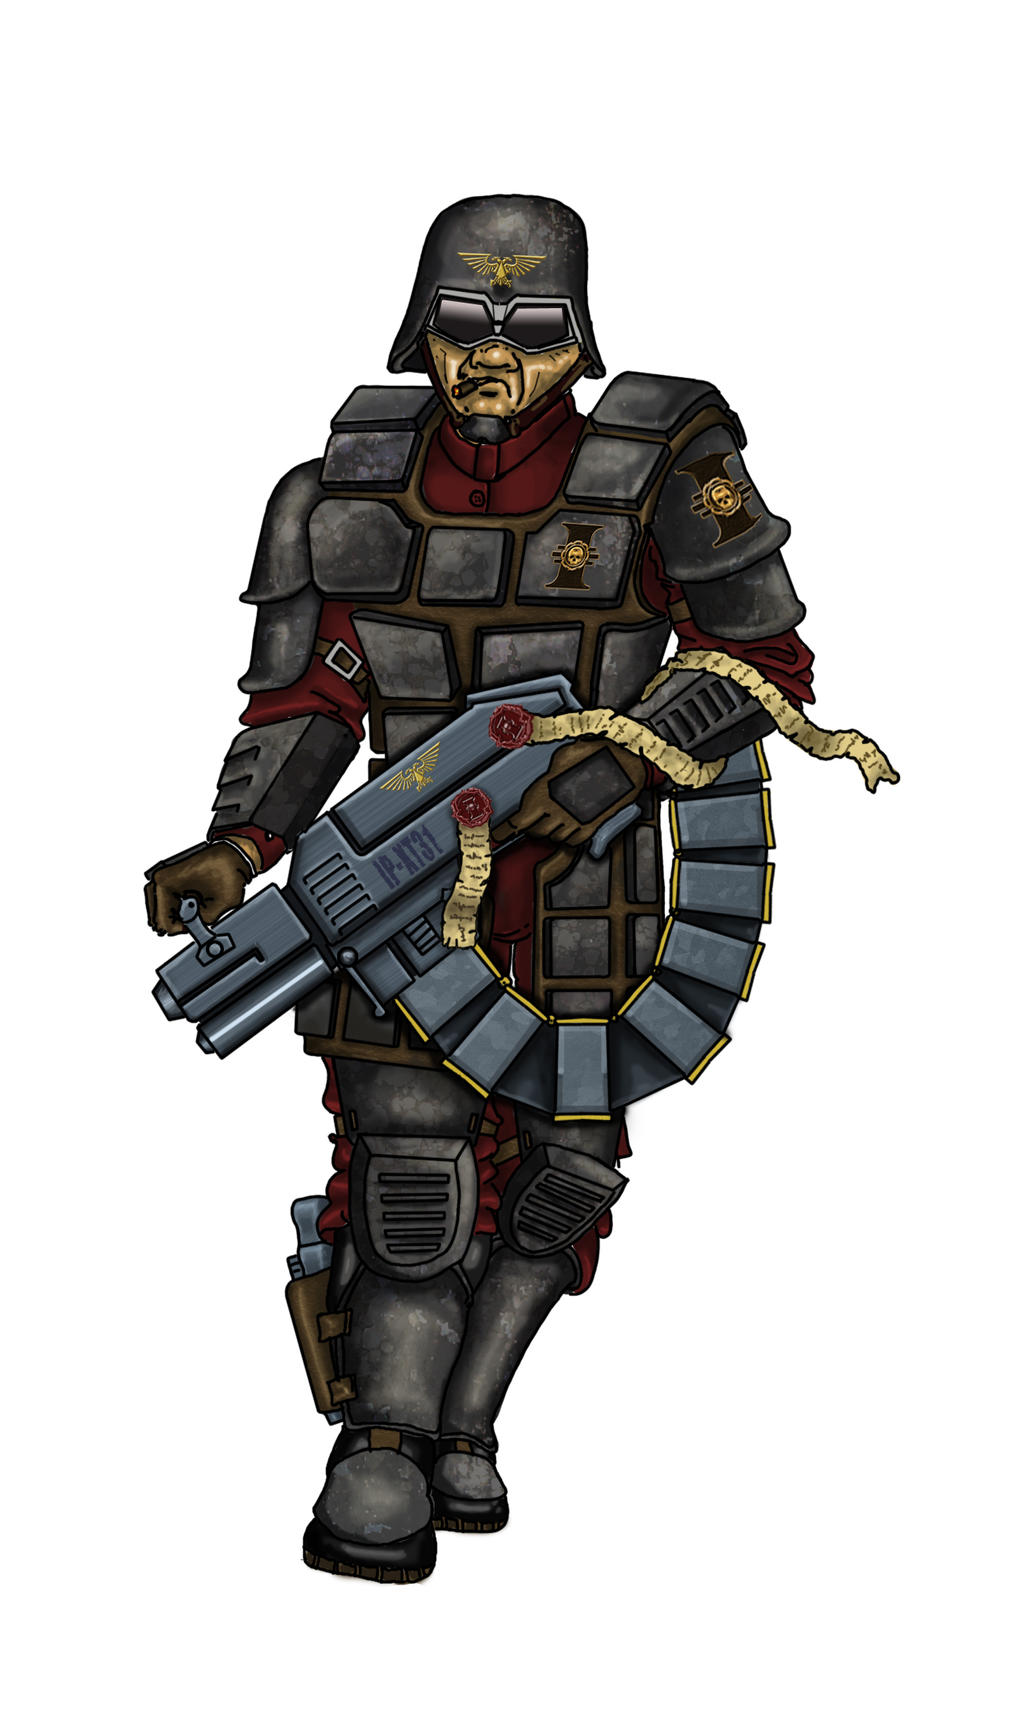 Inquisition-Guardsman by winterfluss